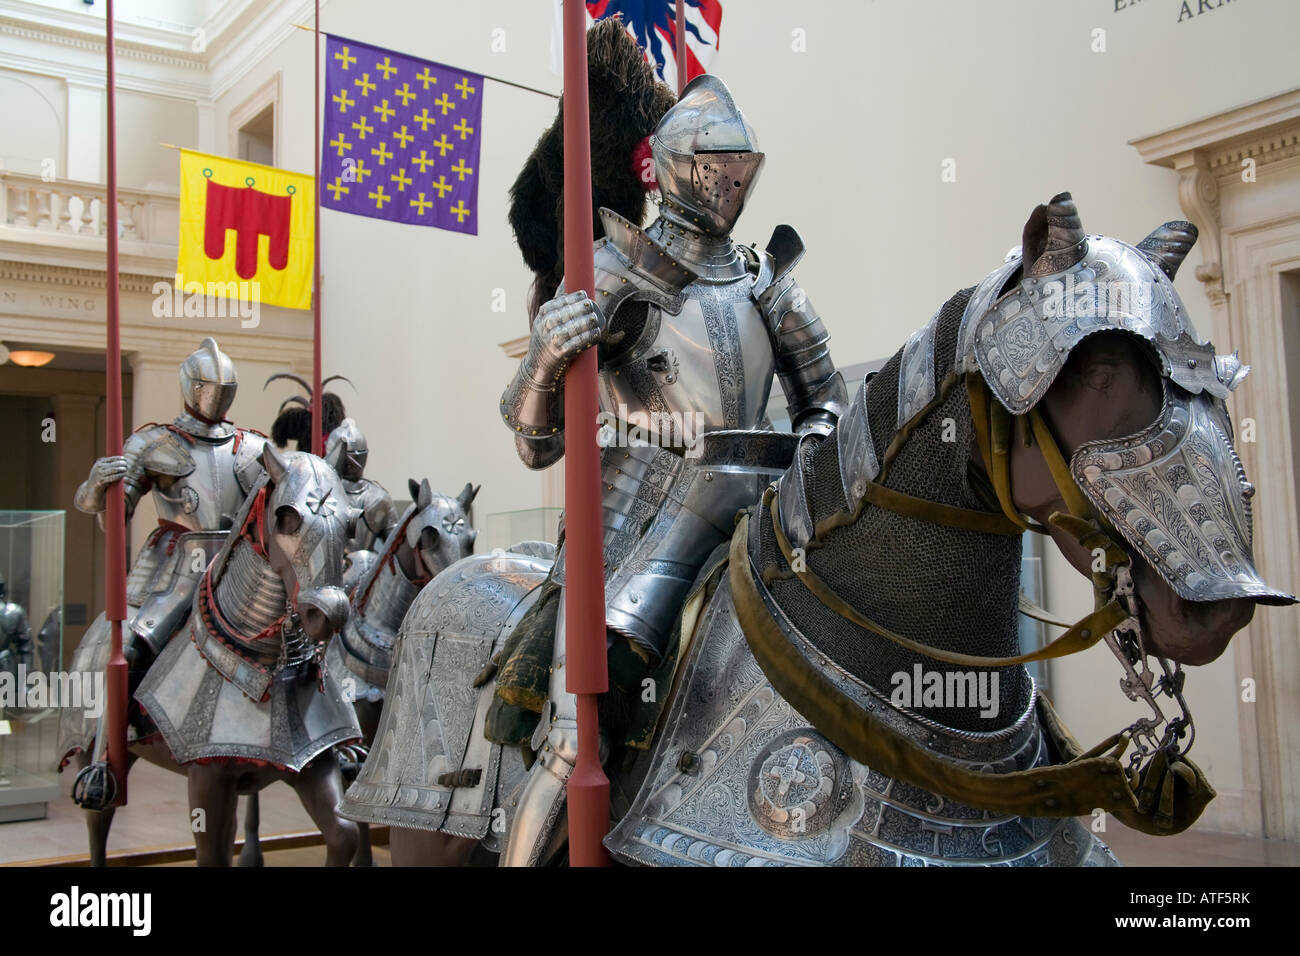 Arms and Armor, Metropolitan Museum of Art, Manhattan, New York - Stock Image